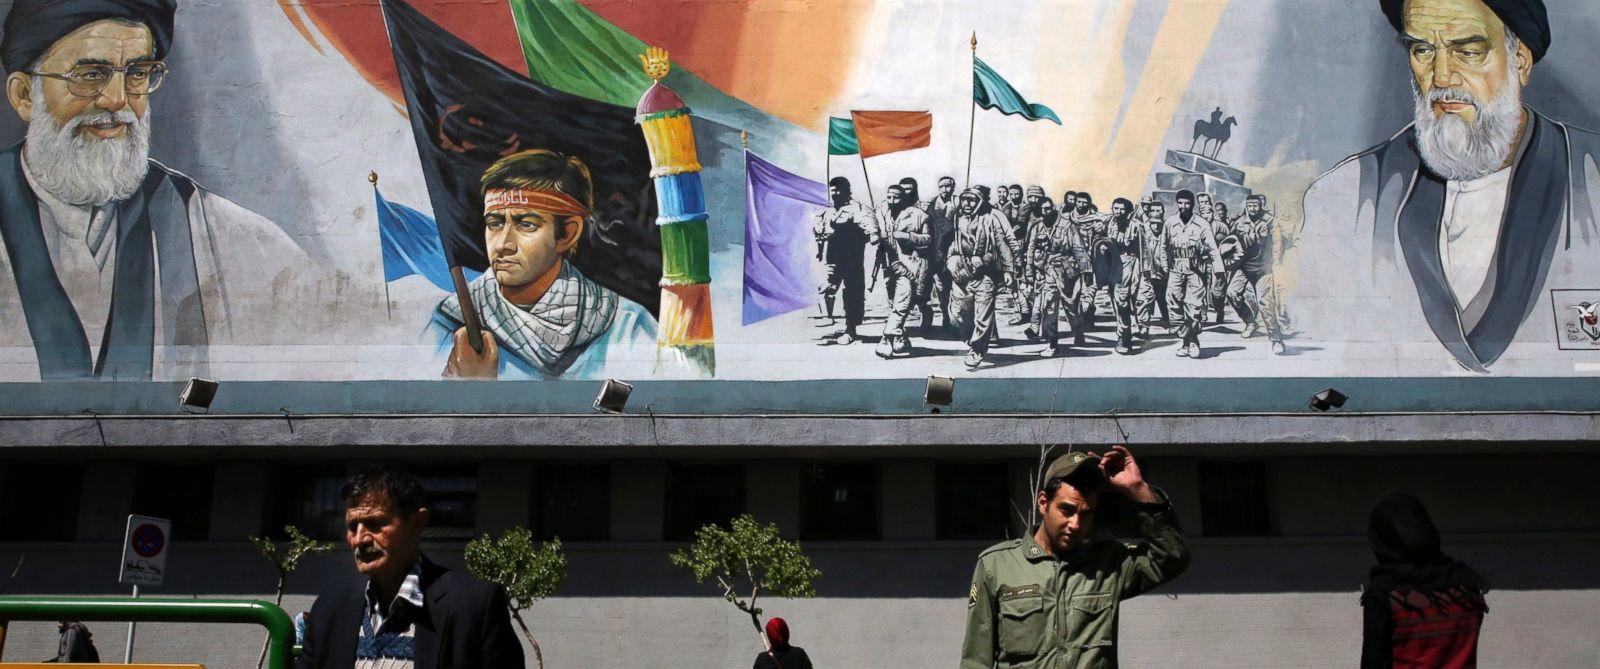 PHOTO: Pedestrians cross the Enqelab-e-Eslami street under a mural depicting the late Iranian revolutionary founder Ayatollah Khomeini, members of Basij paramilitary force and Supreme Leader Ayatollah Ali Khamenei in Tehran, Iran, March 31, 2015.